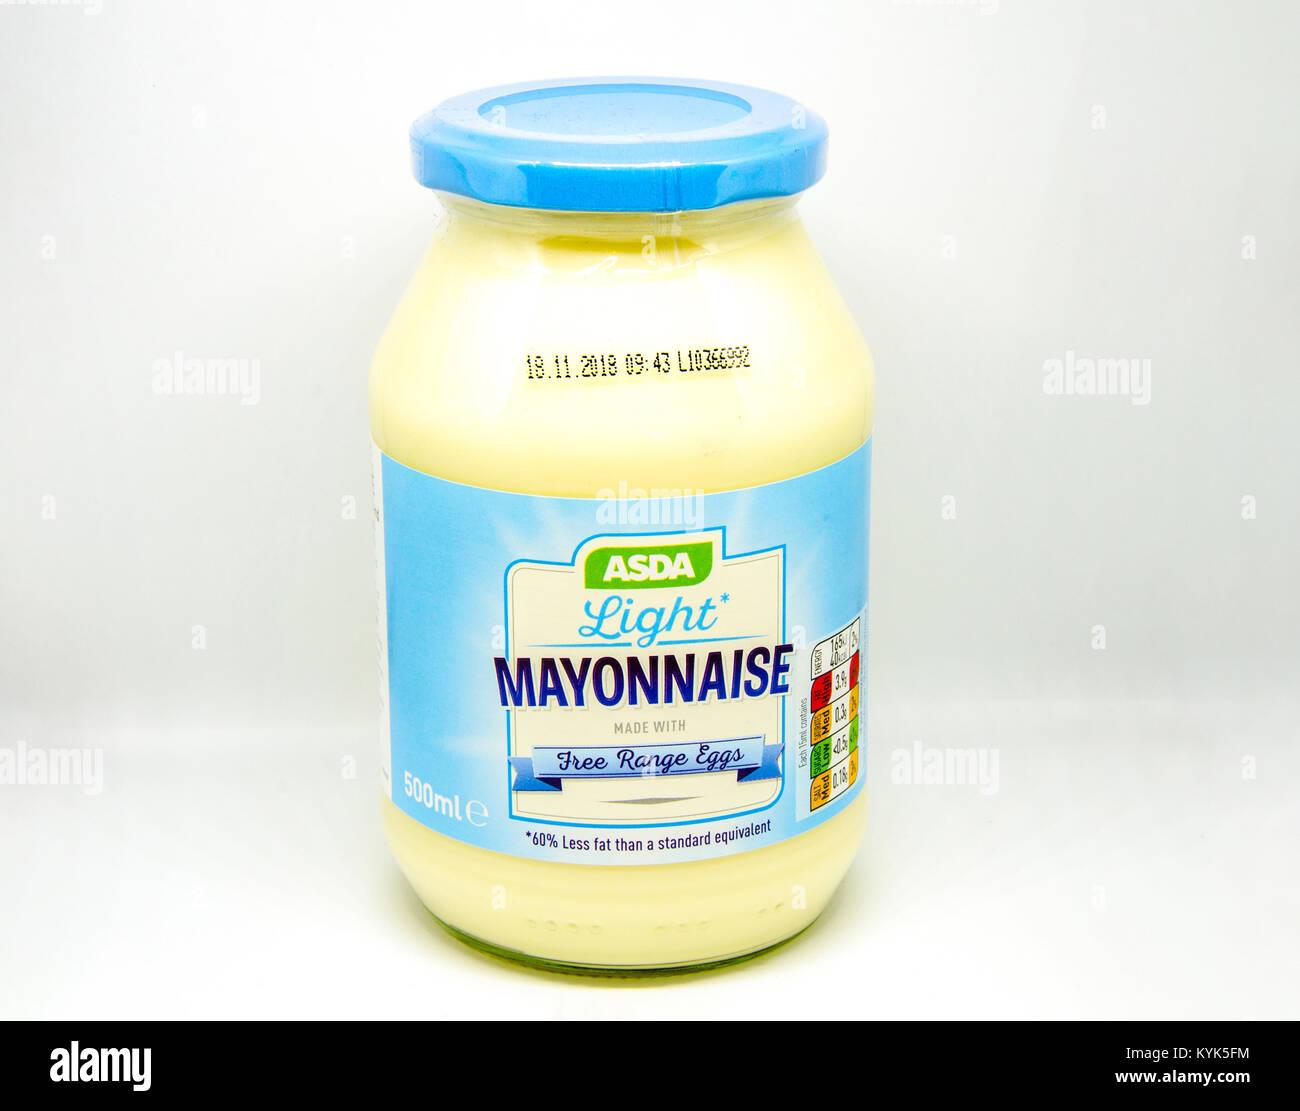 A Jar Of Asda Light Mayonnaise Photographed Against A White